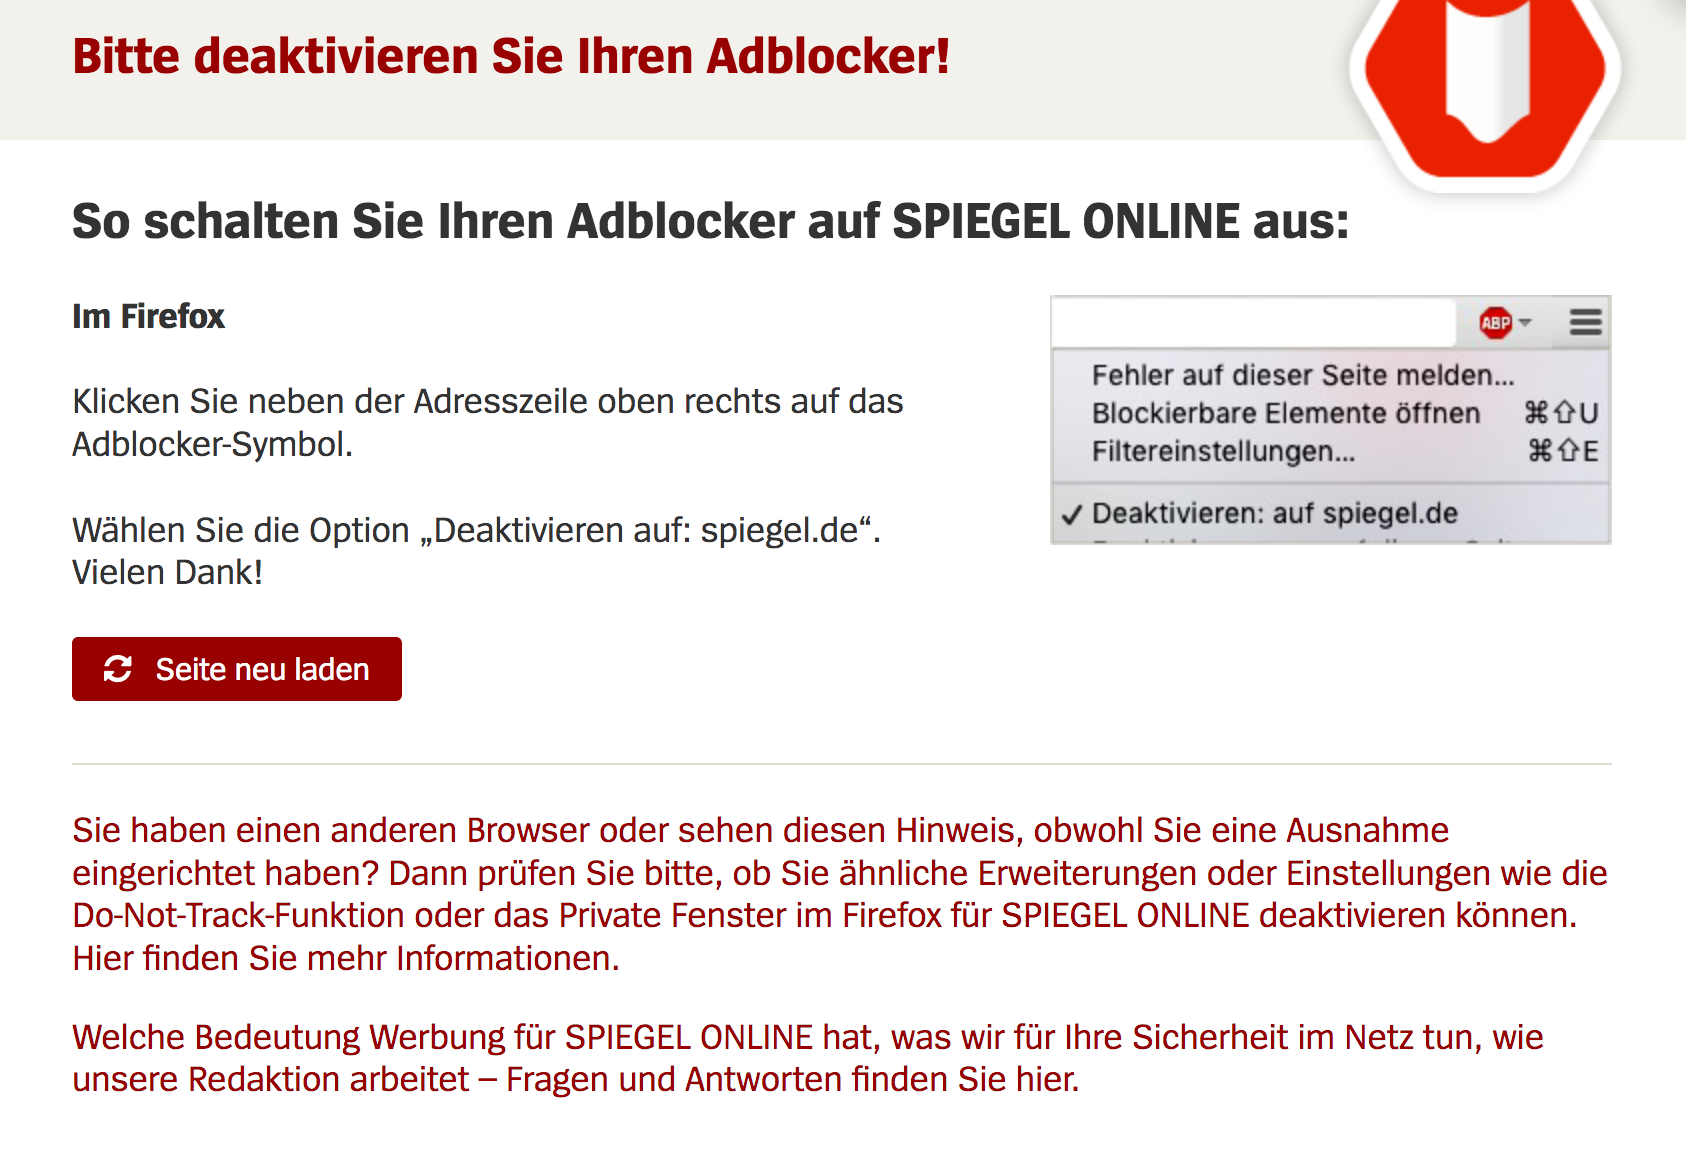 Der Spiegel De.Www Spiegel De Is Withholding Contents Even When Whitelisted Pb